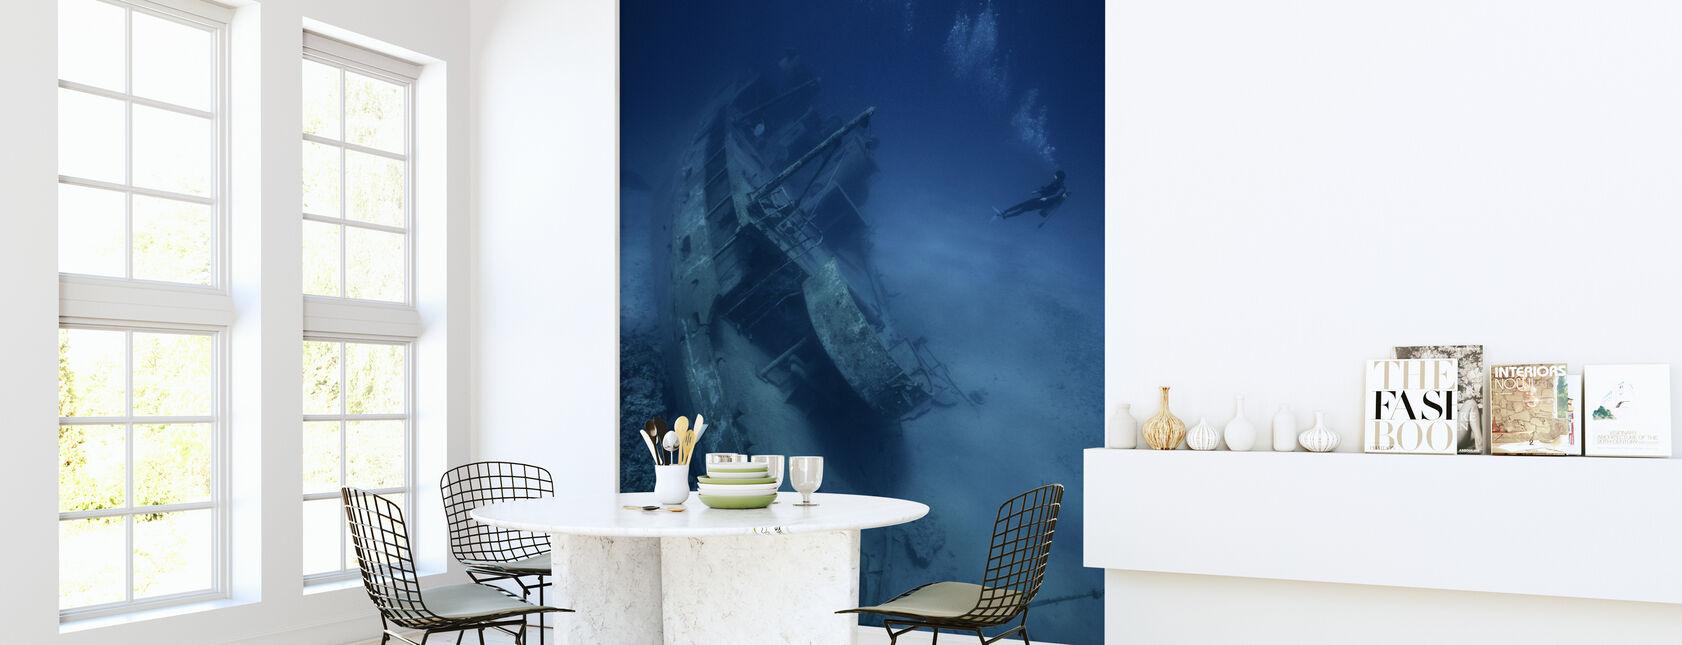 Shipwreck and Diver - Wallpaper - Kitchen